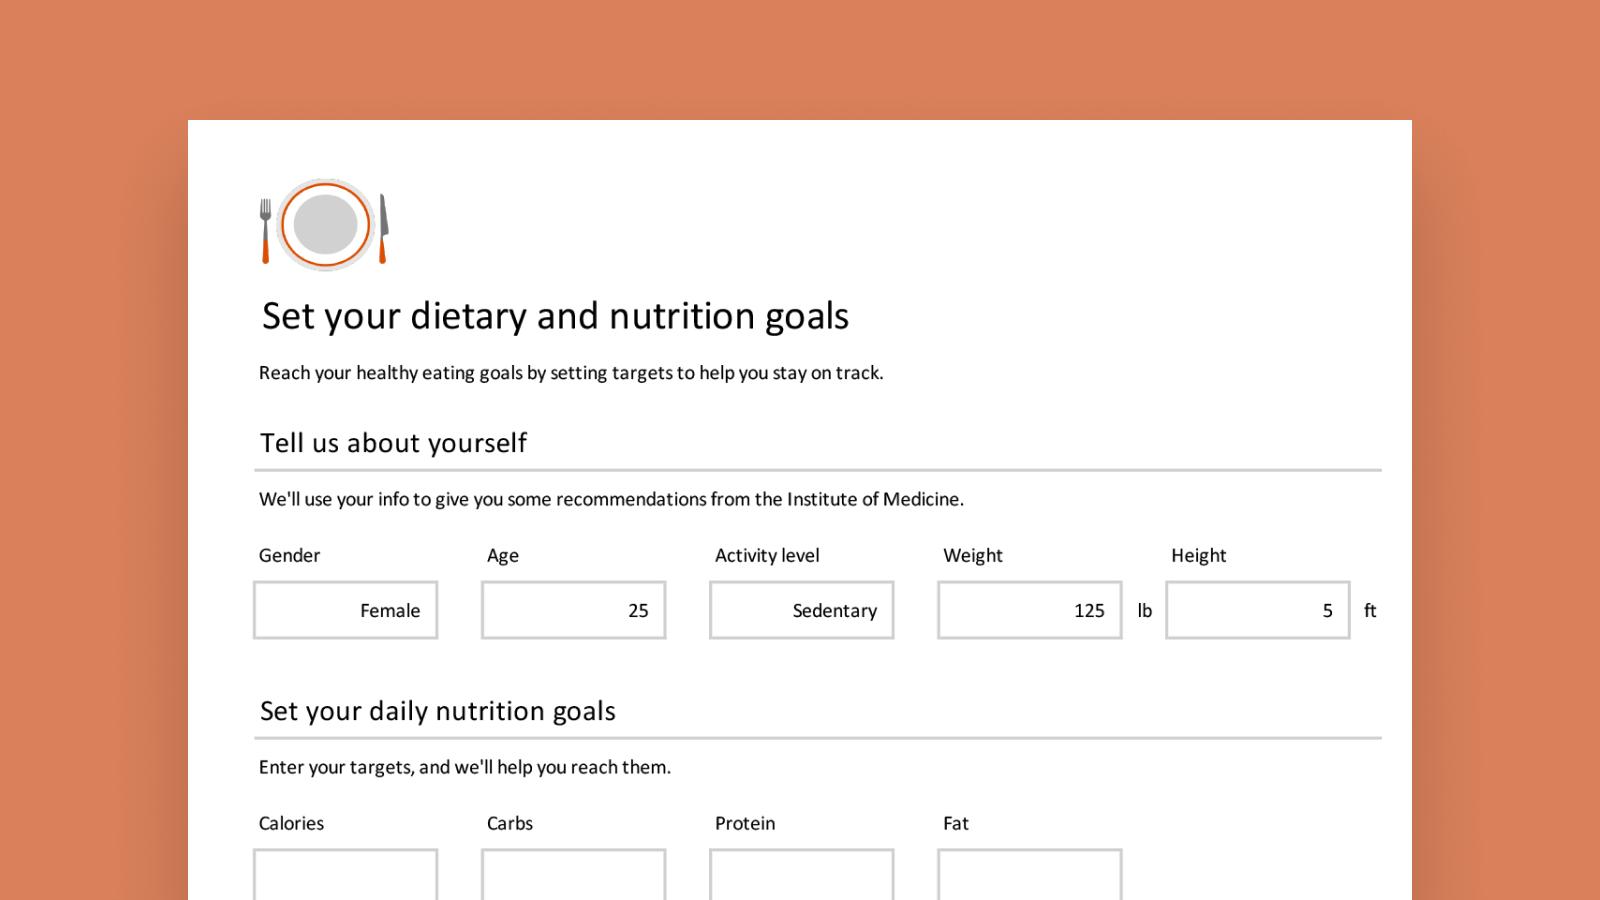 Screenshot of the Nutrition Tracker smart template.